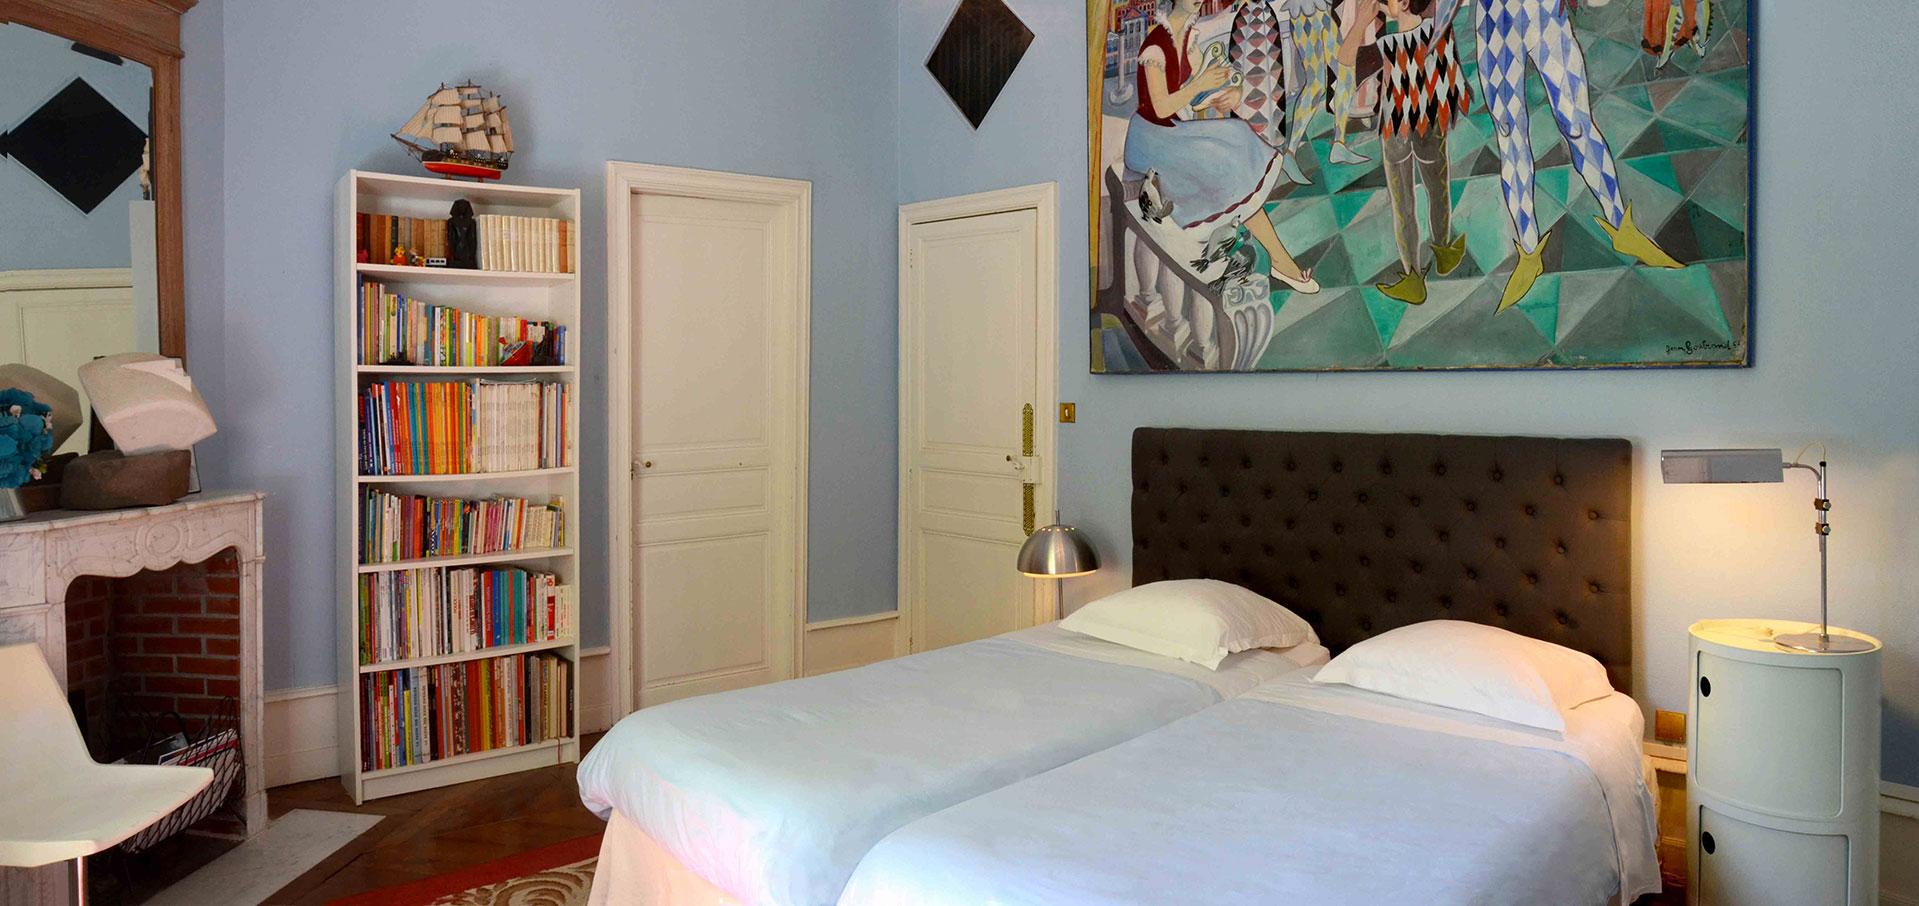 Arlequin bedroom / chambre Arlequin